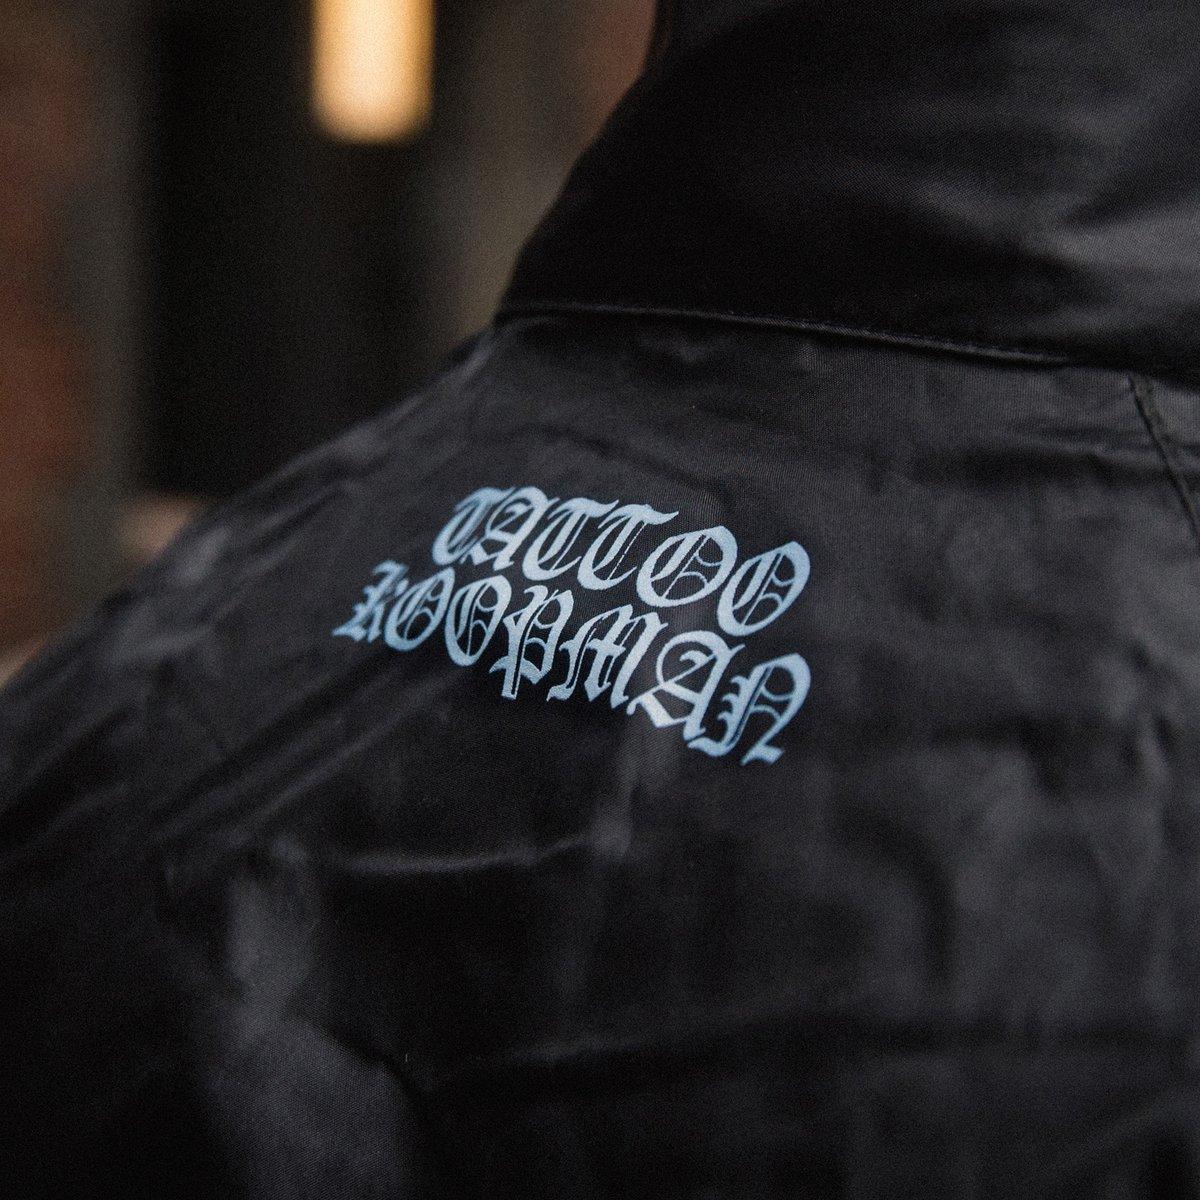 Image of KPMN Waterproof Jacket